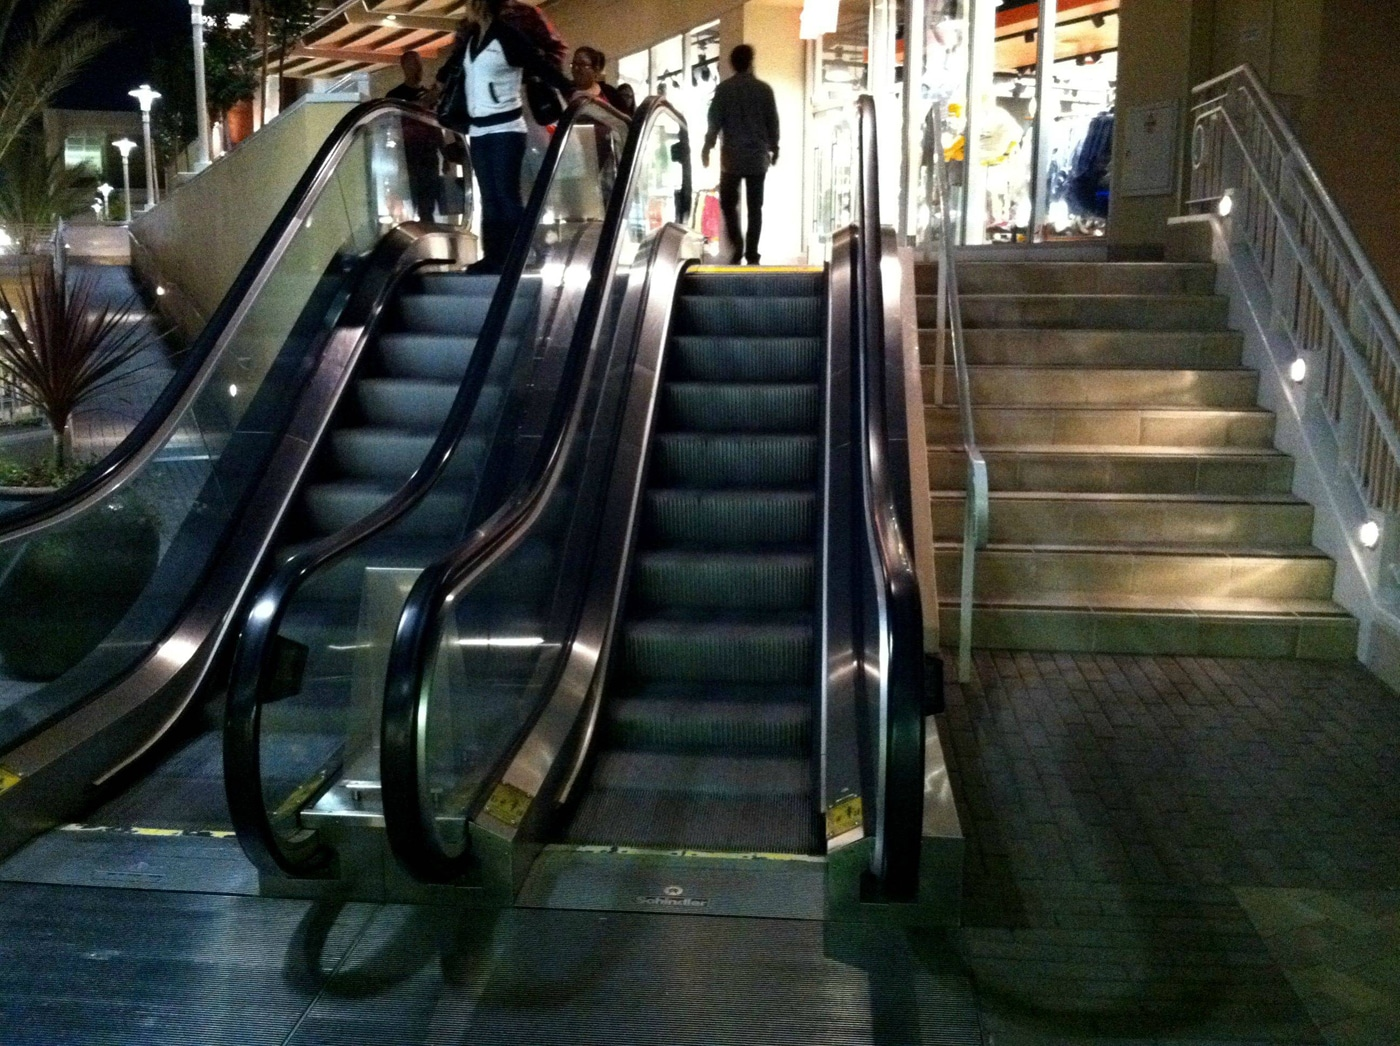 World's Shortest Escalator (Less Than 3 Feet) Is A Glorious Experience